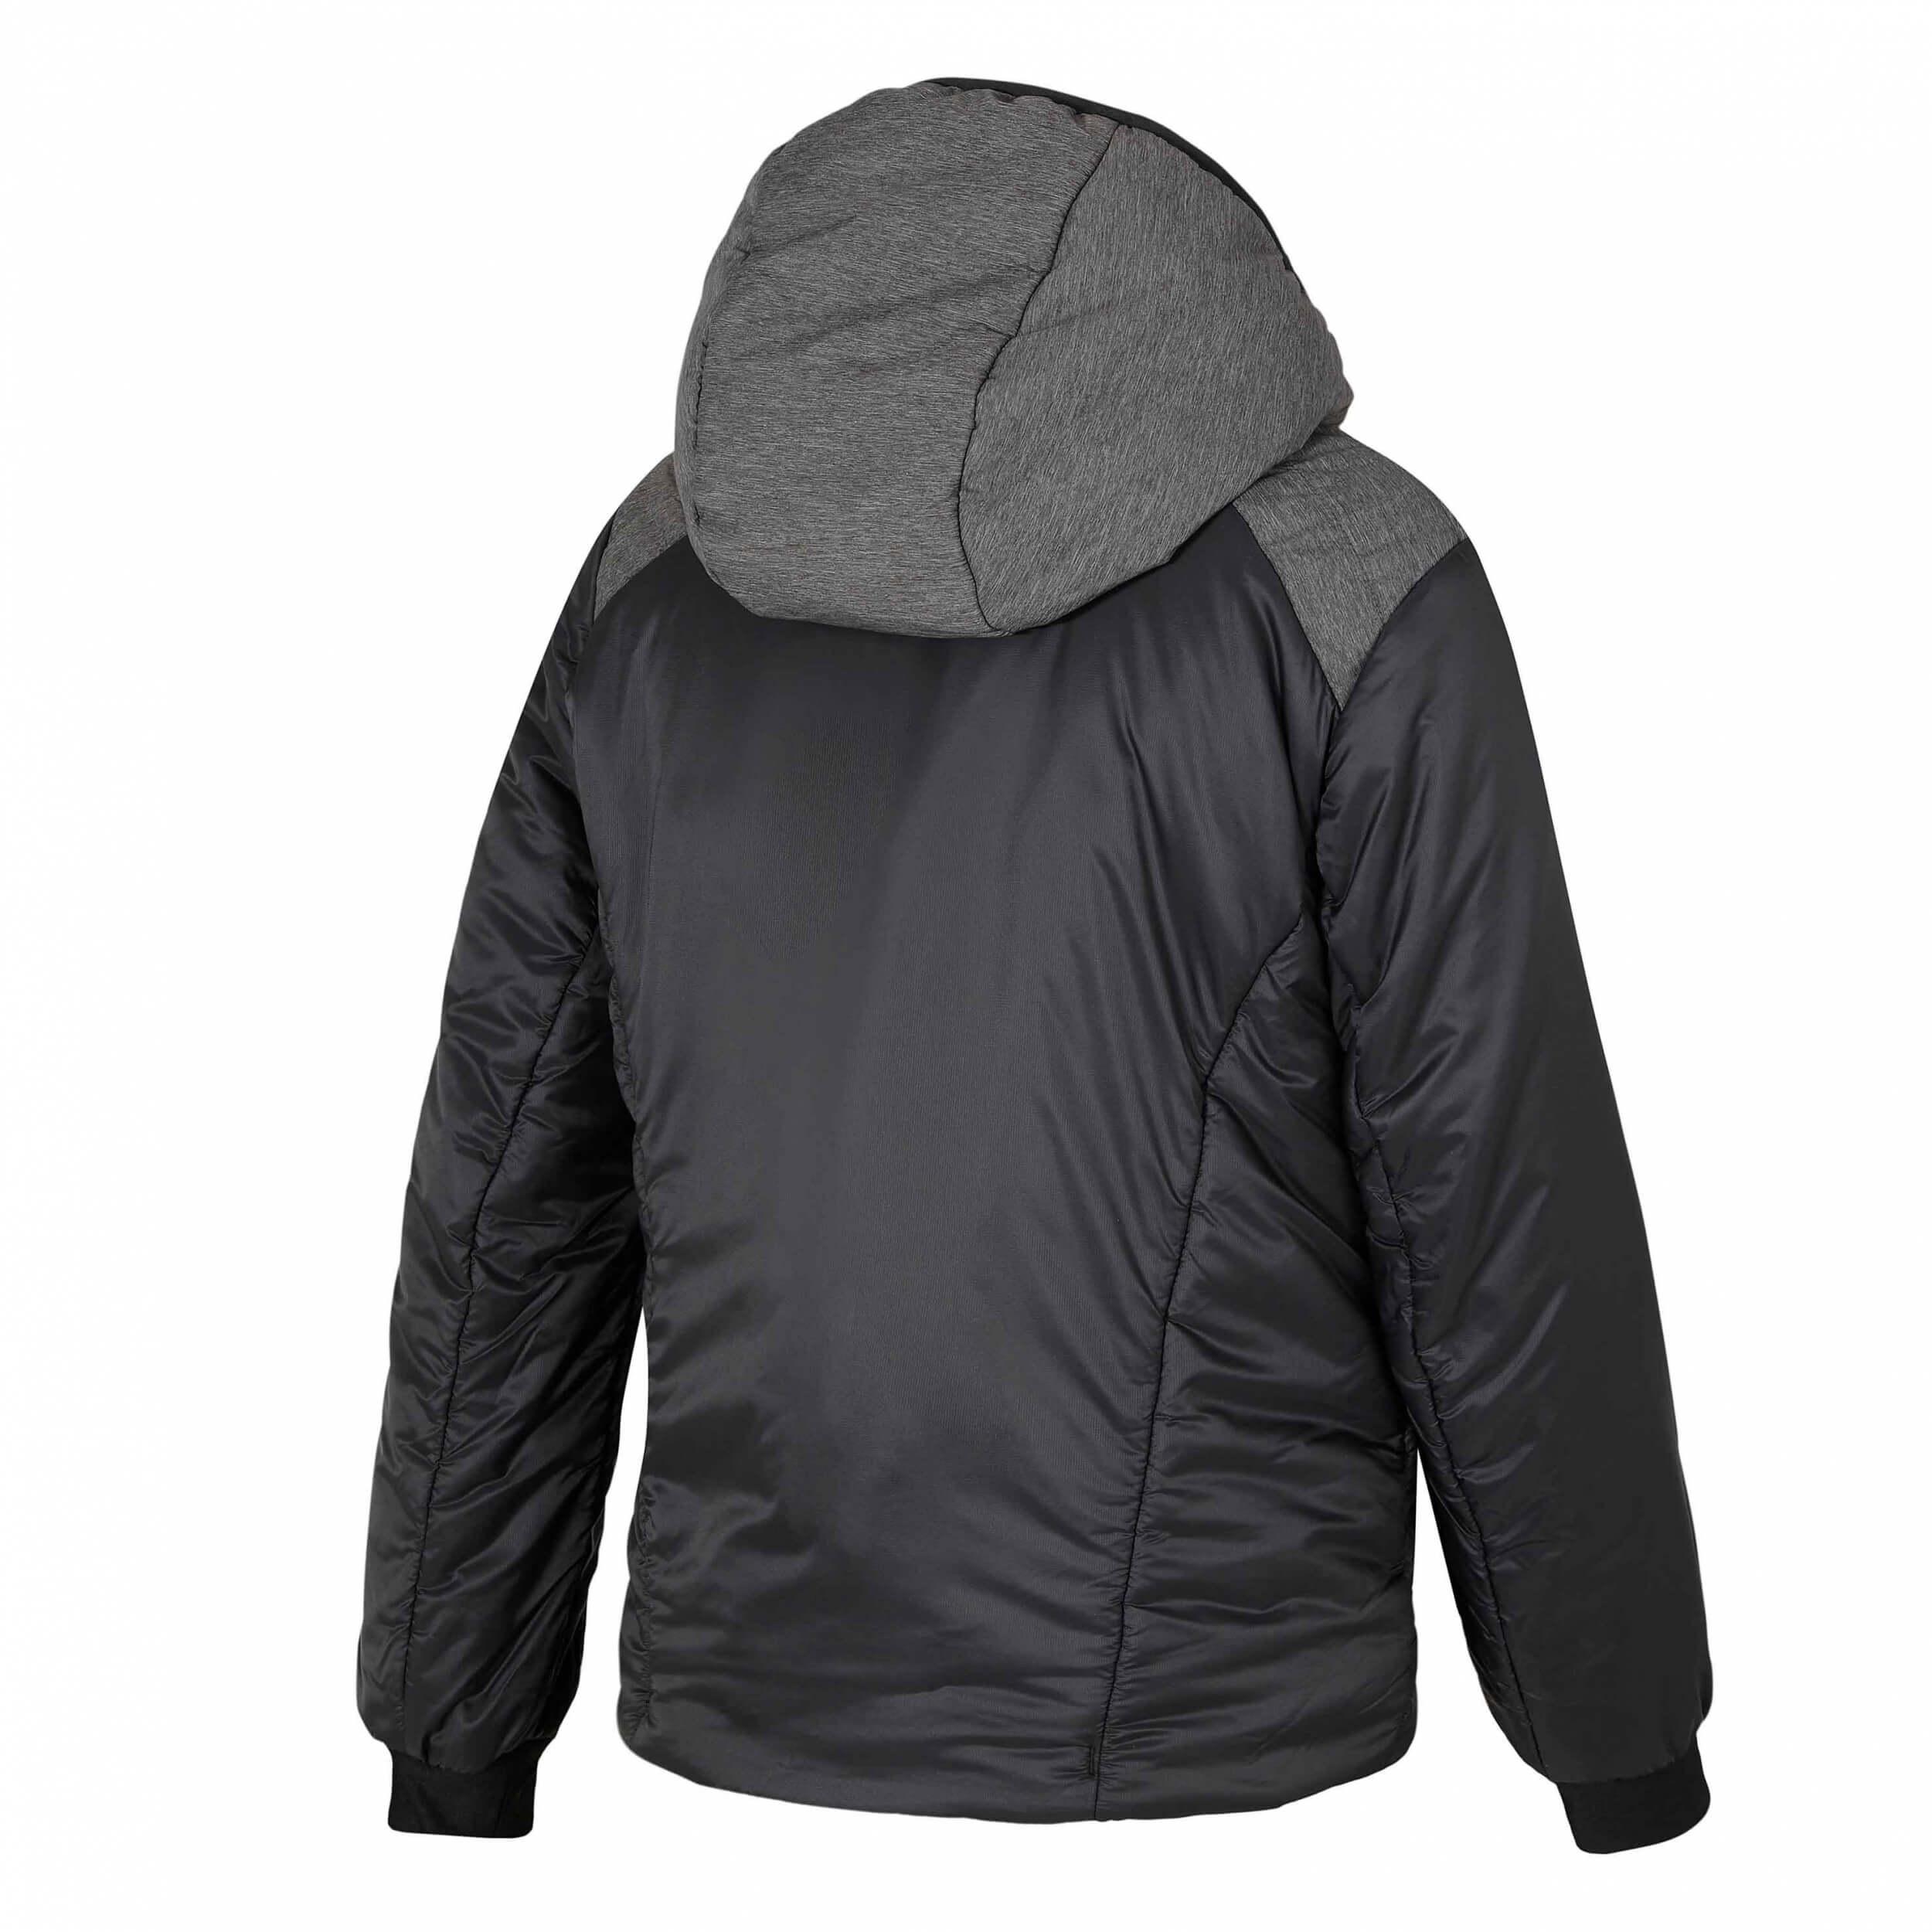 ZIENER Kinder Wärmejacke Jolo WINDSHIELD grau schwarz 12817